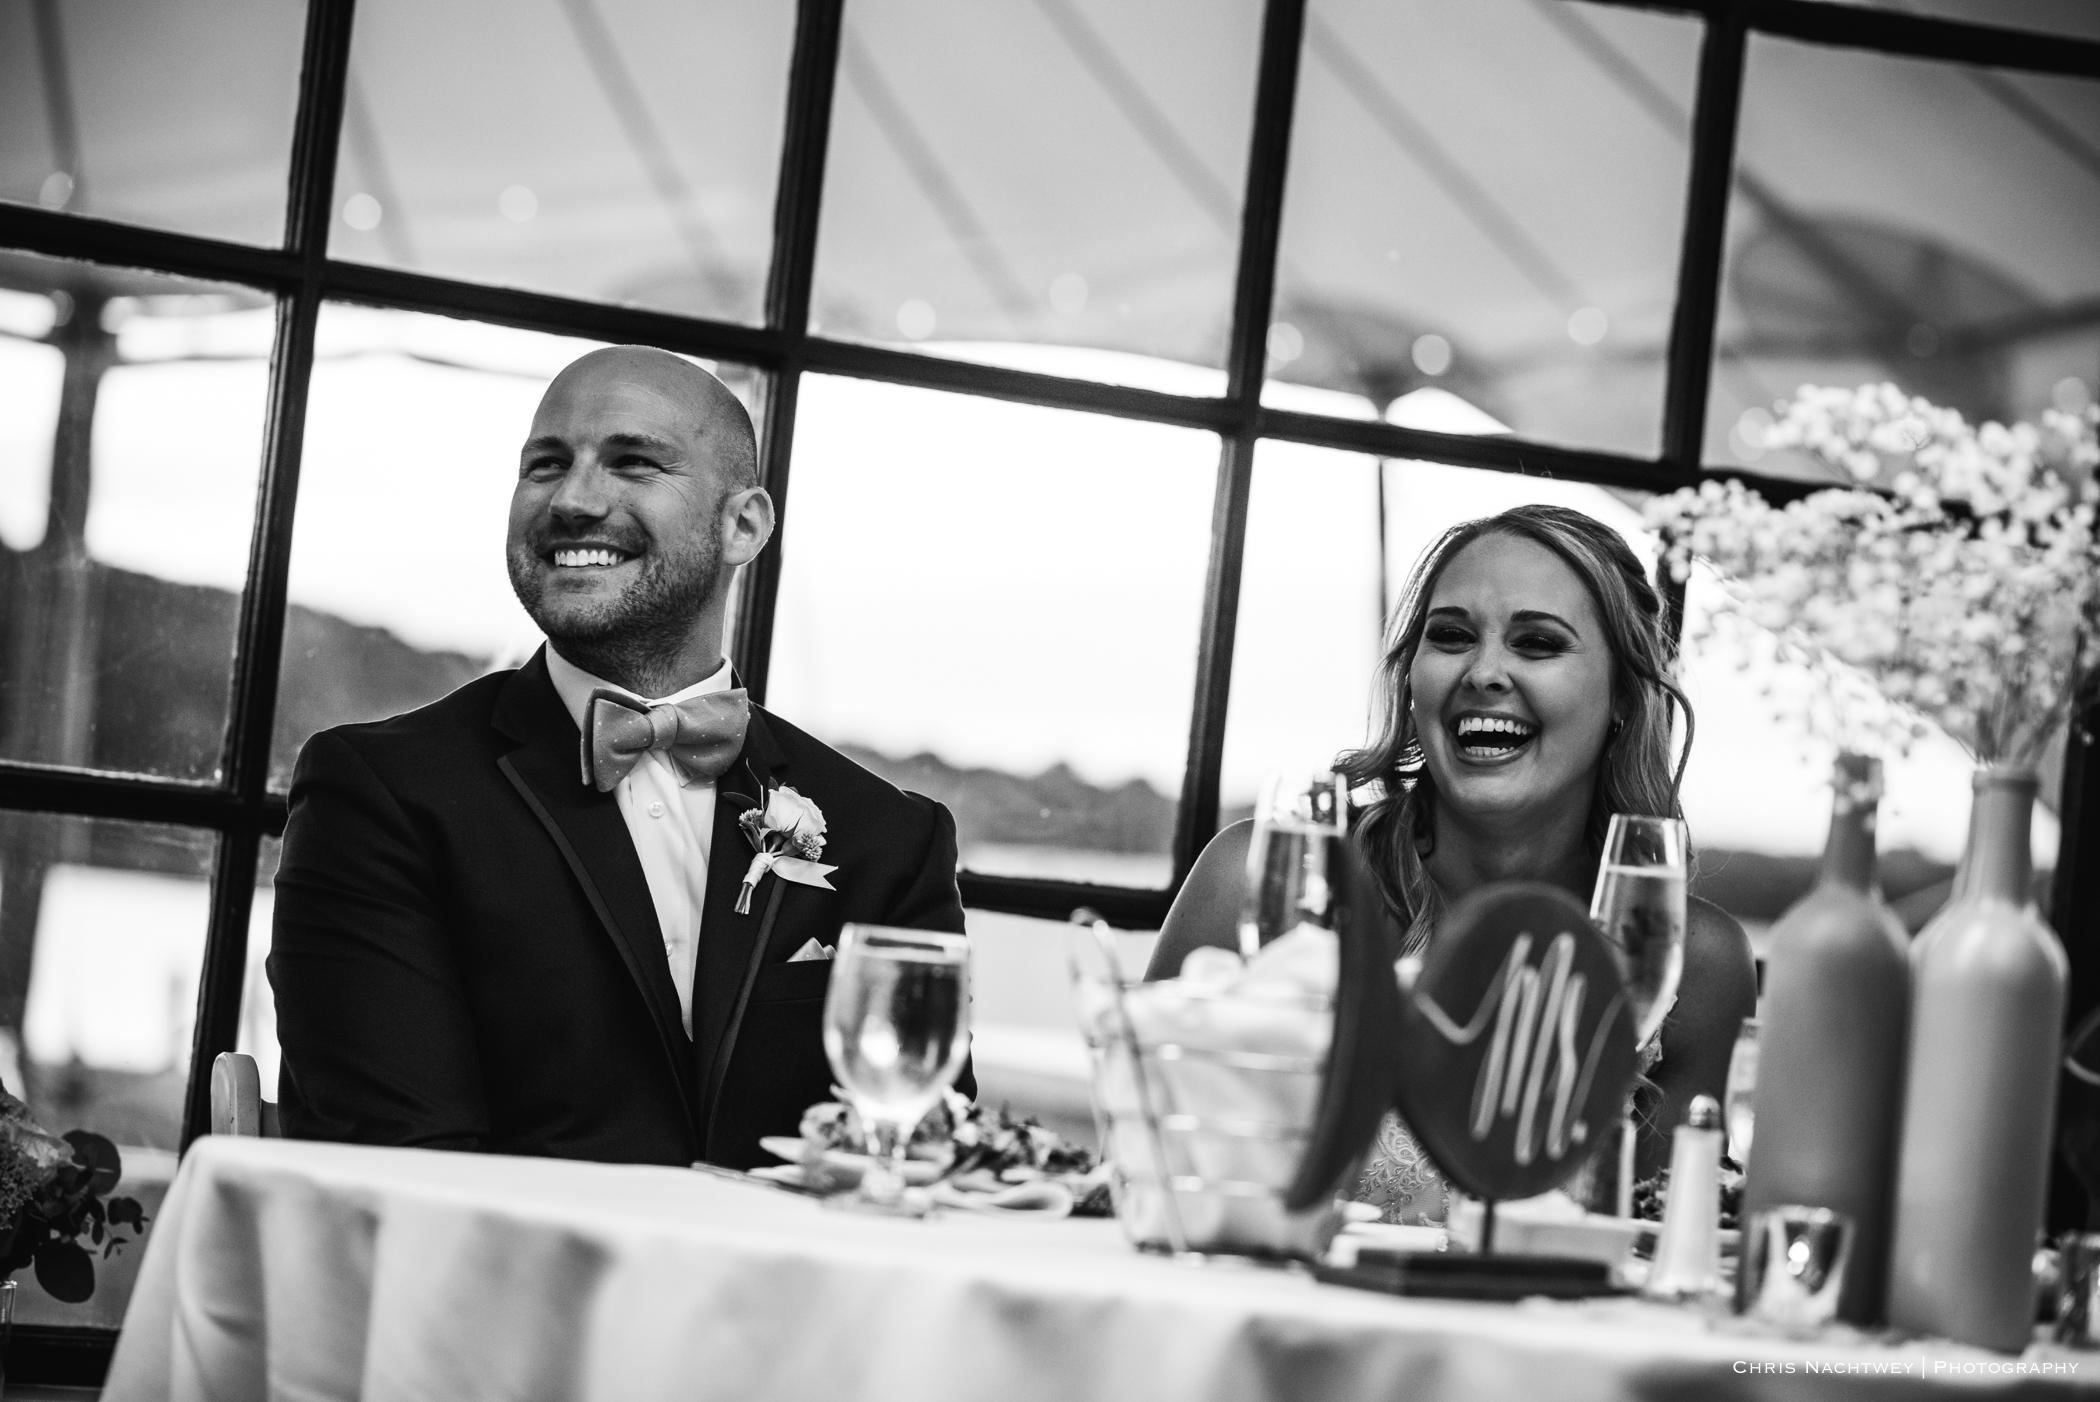 mystic-ct-artistic-wedding-photographers-chris-nachtwey-tany-mike-2017-47.jpg